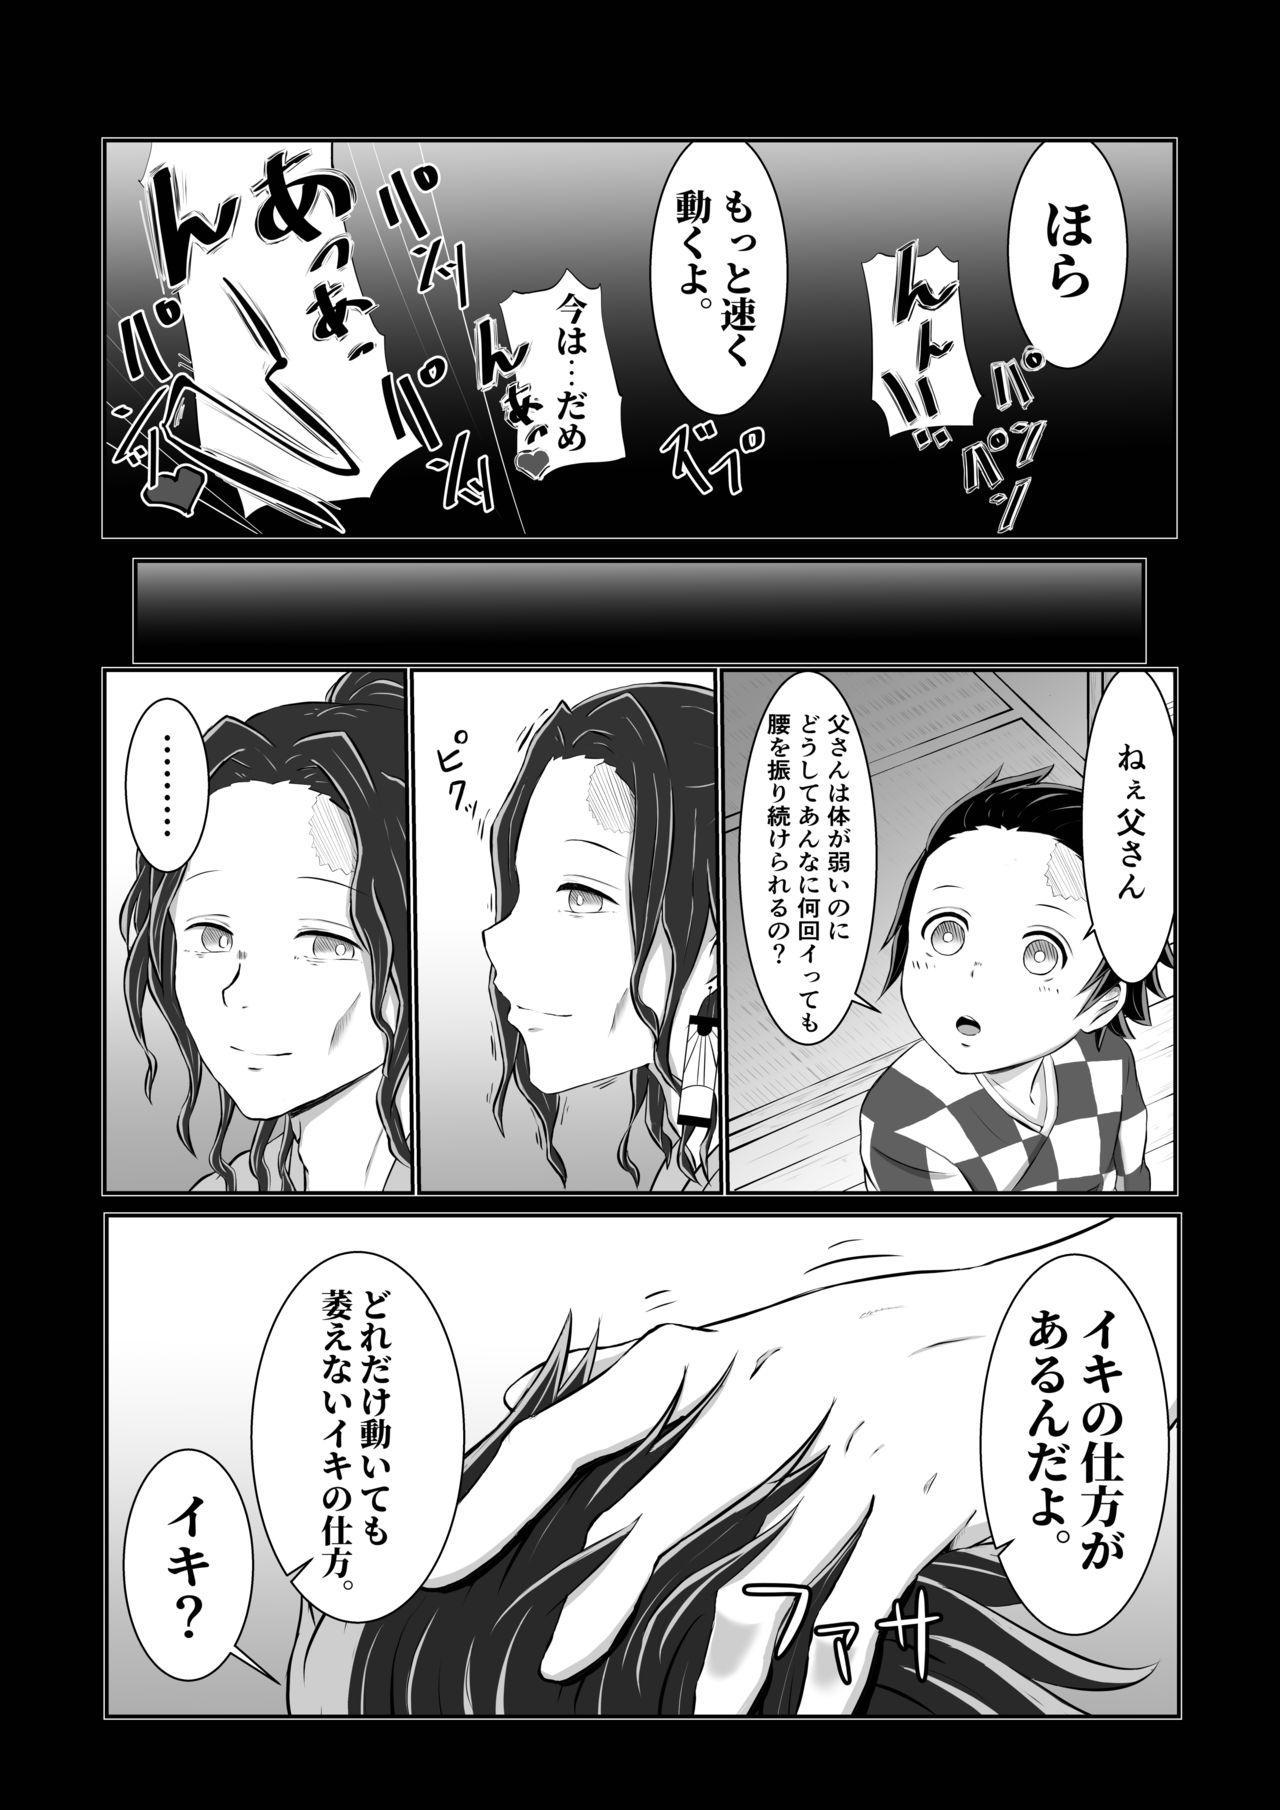 Hinokami Sex. 21